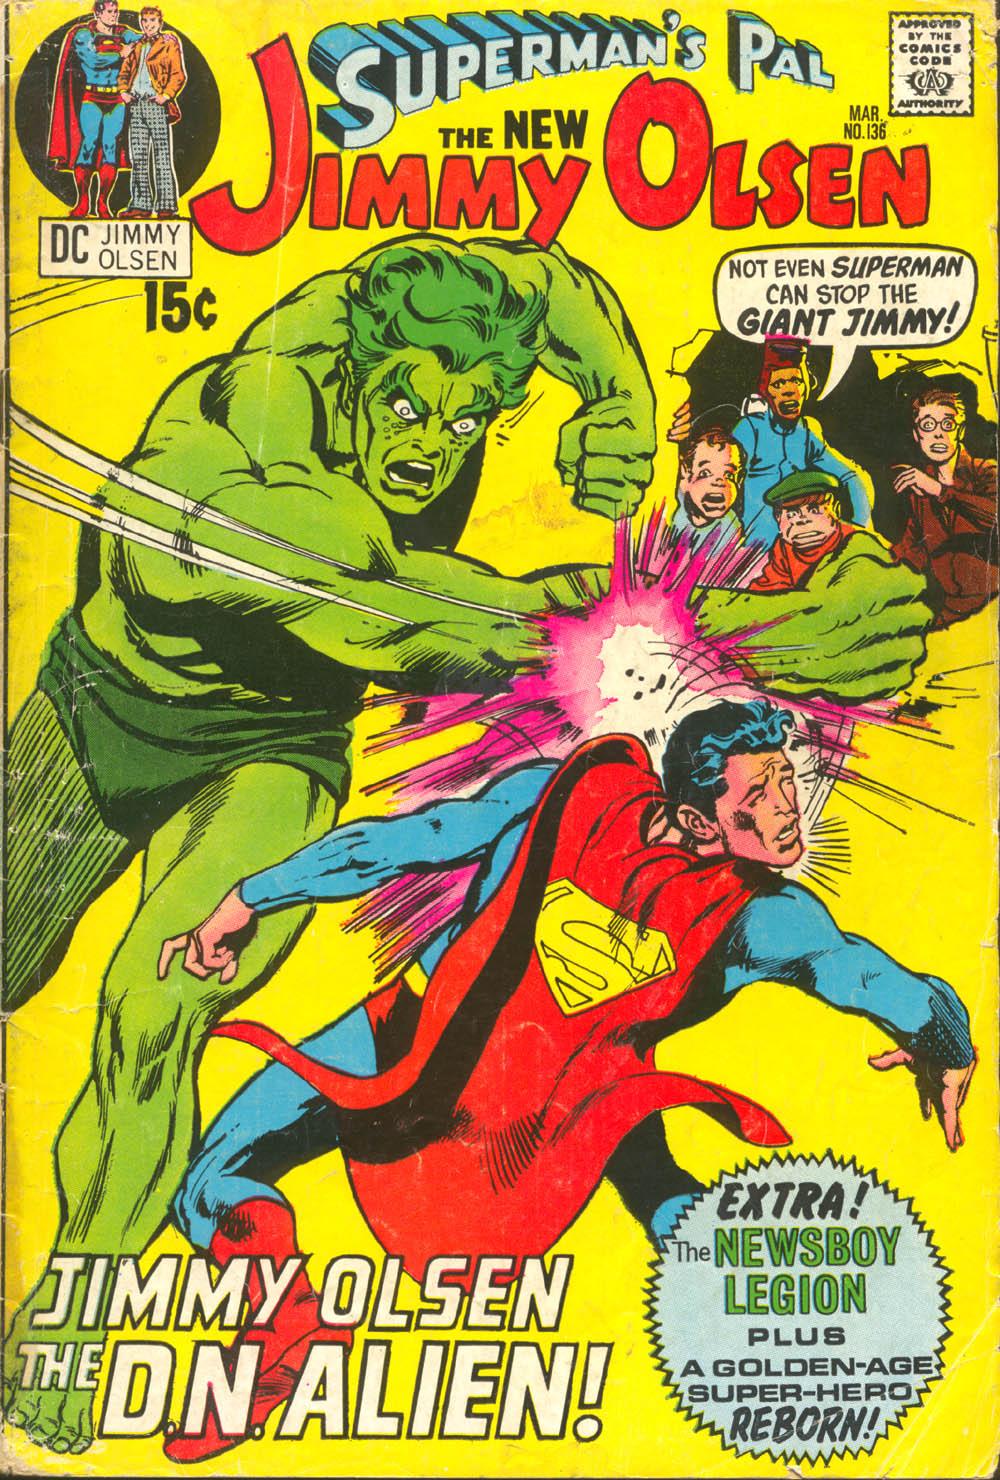 Supermans Pal Jimmy Olsen (1954) 136 Page 1